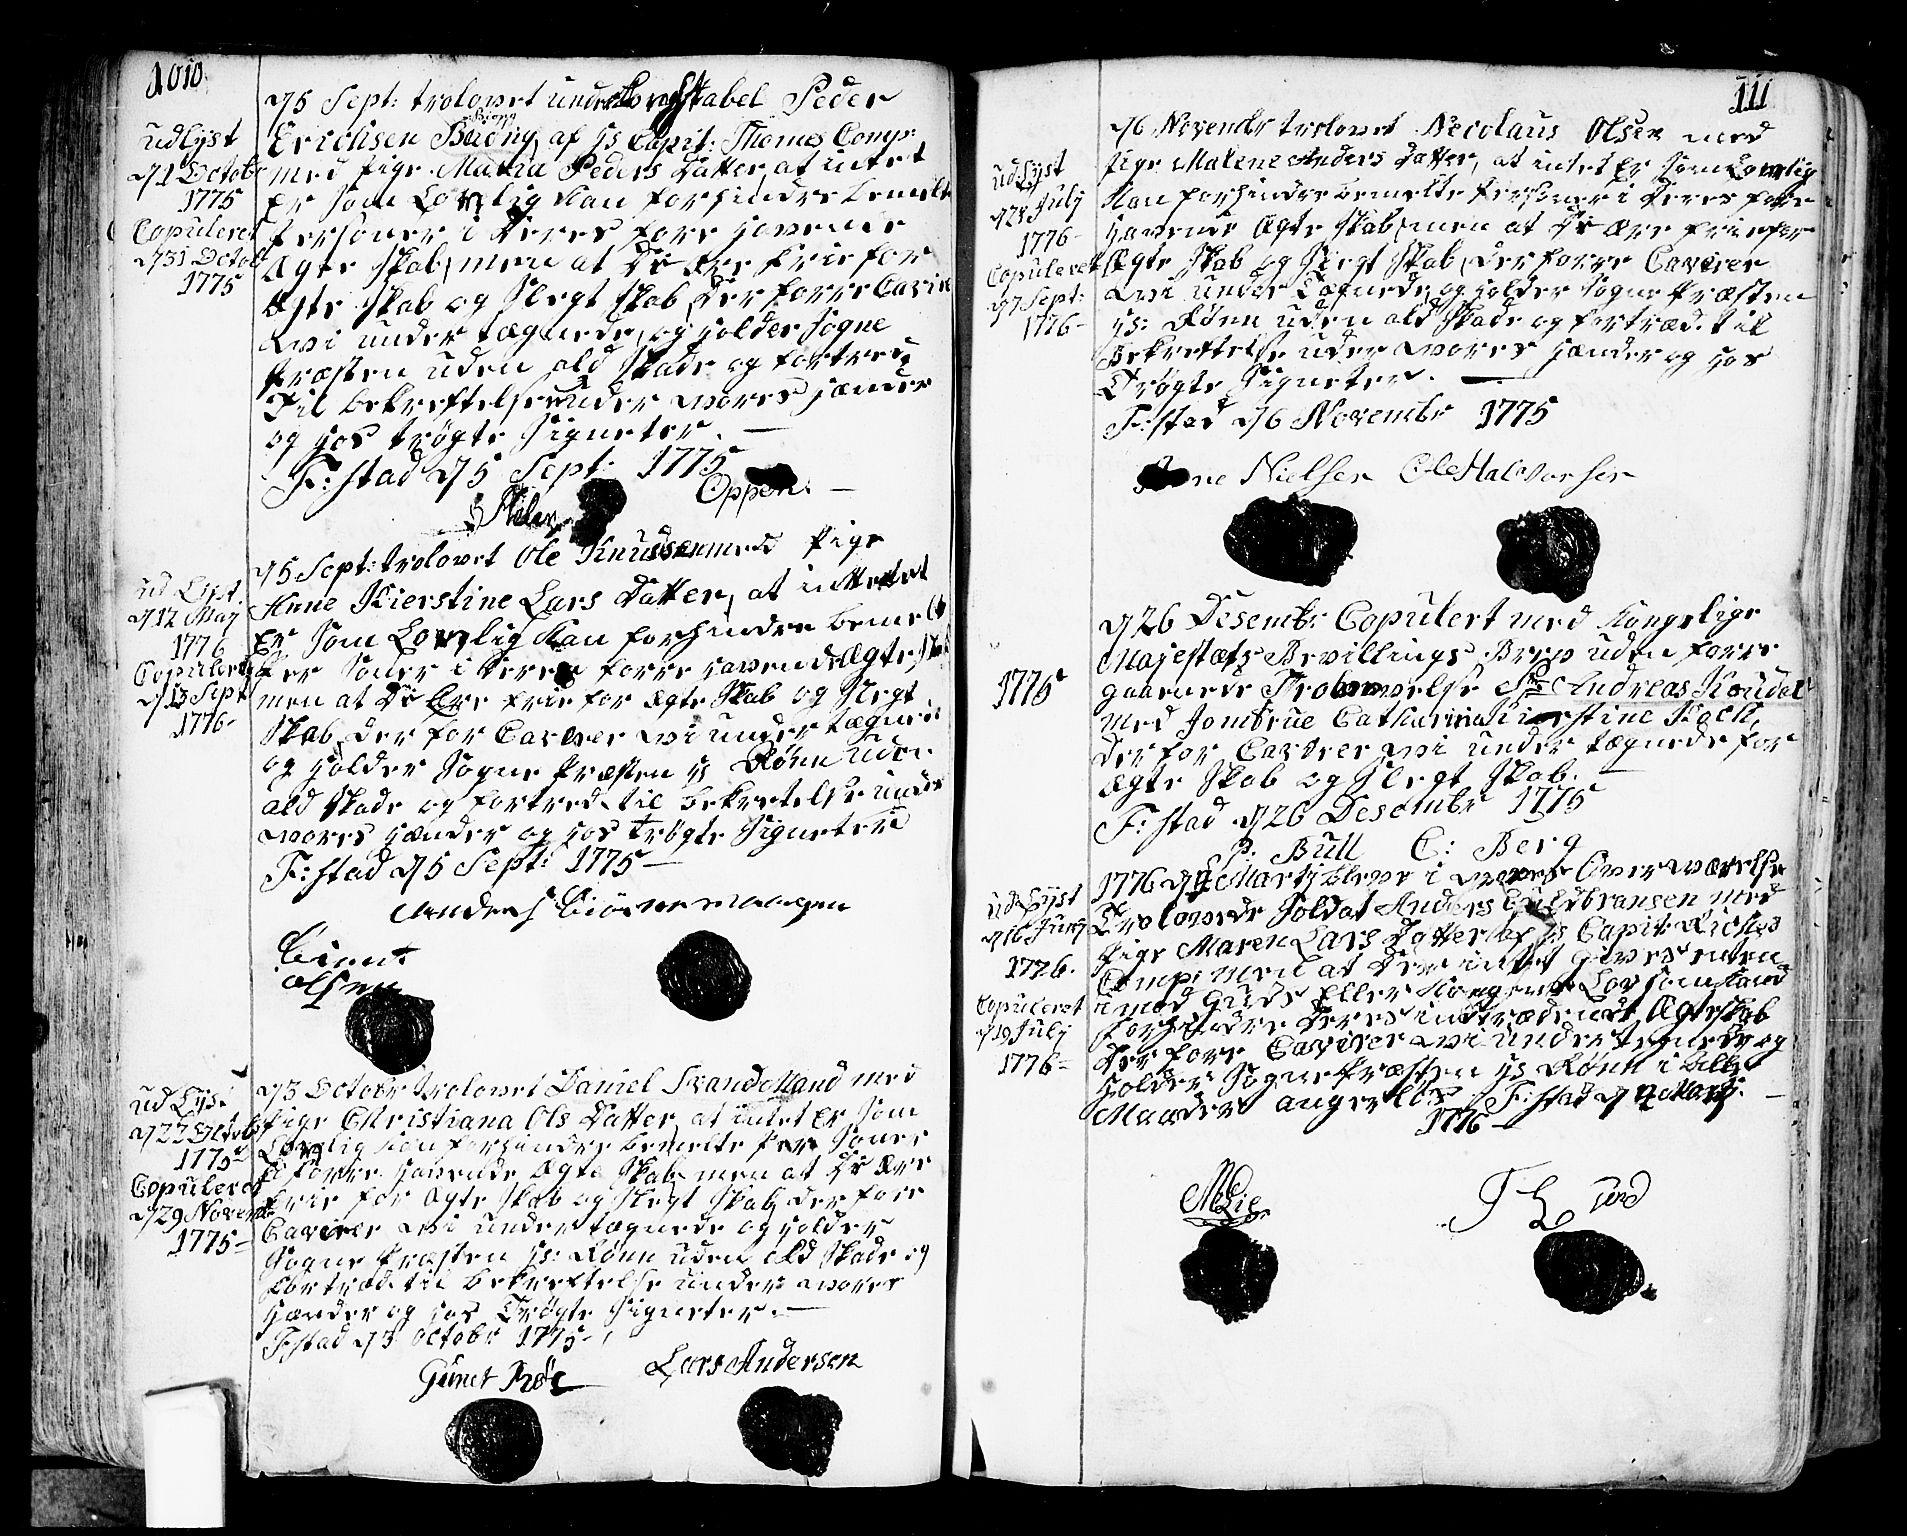 SAO, Fredrikstad prestekontor Kirkebøker, F/Fa/L0002: Ministerialbok nr. 2, 1750-1804, s. 110-111